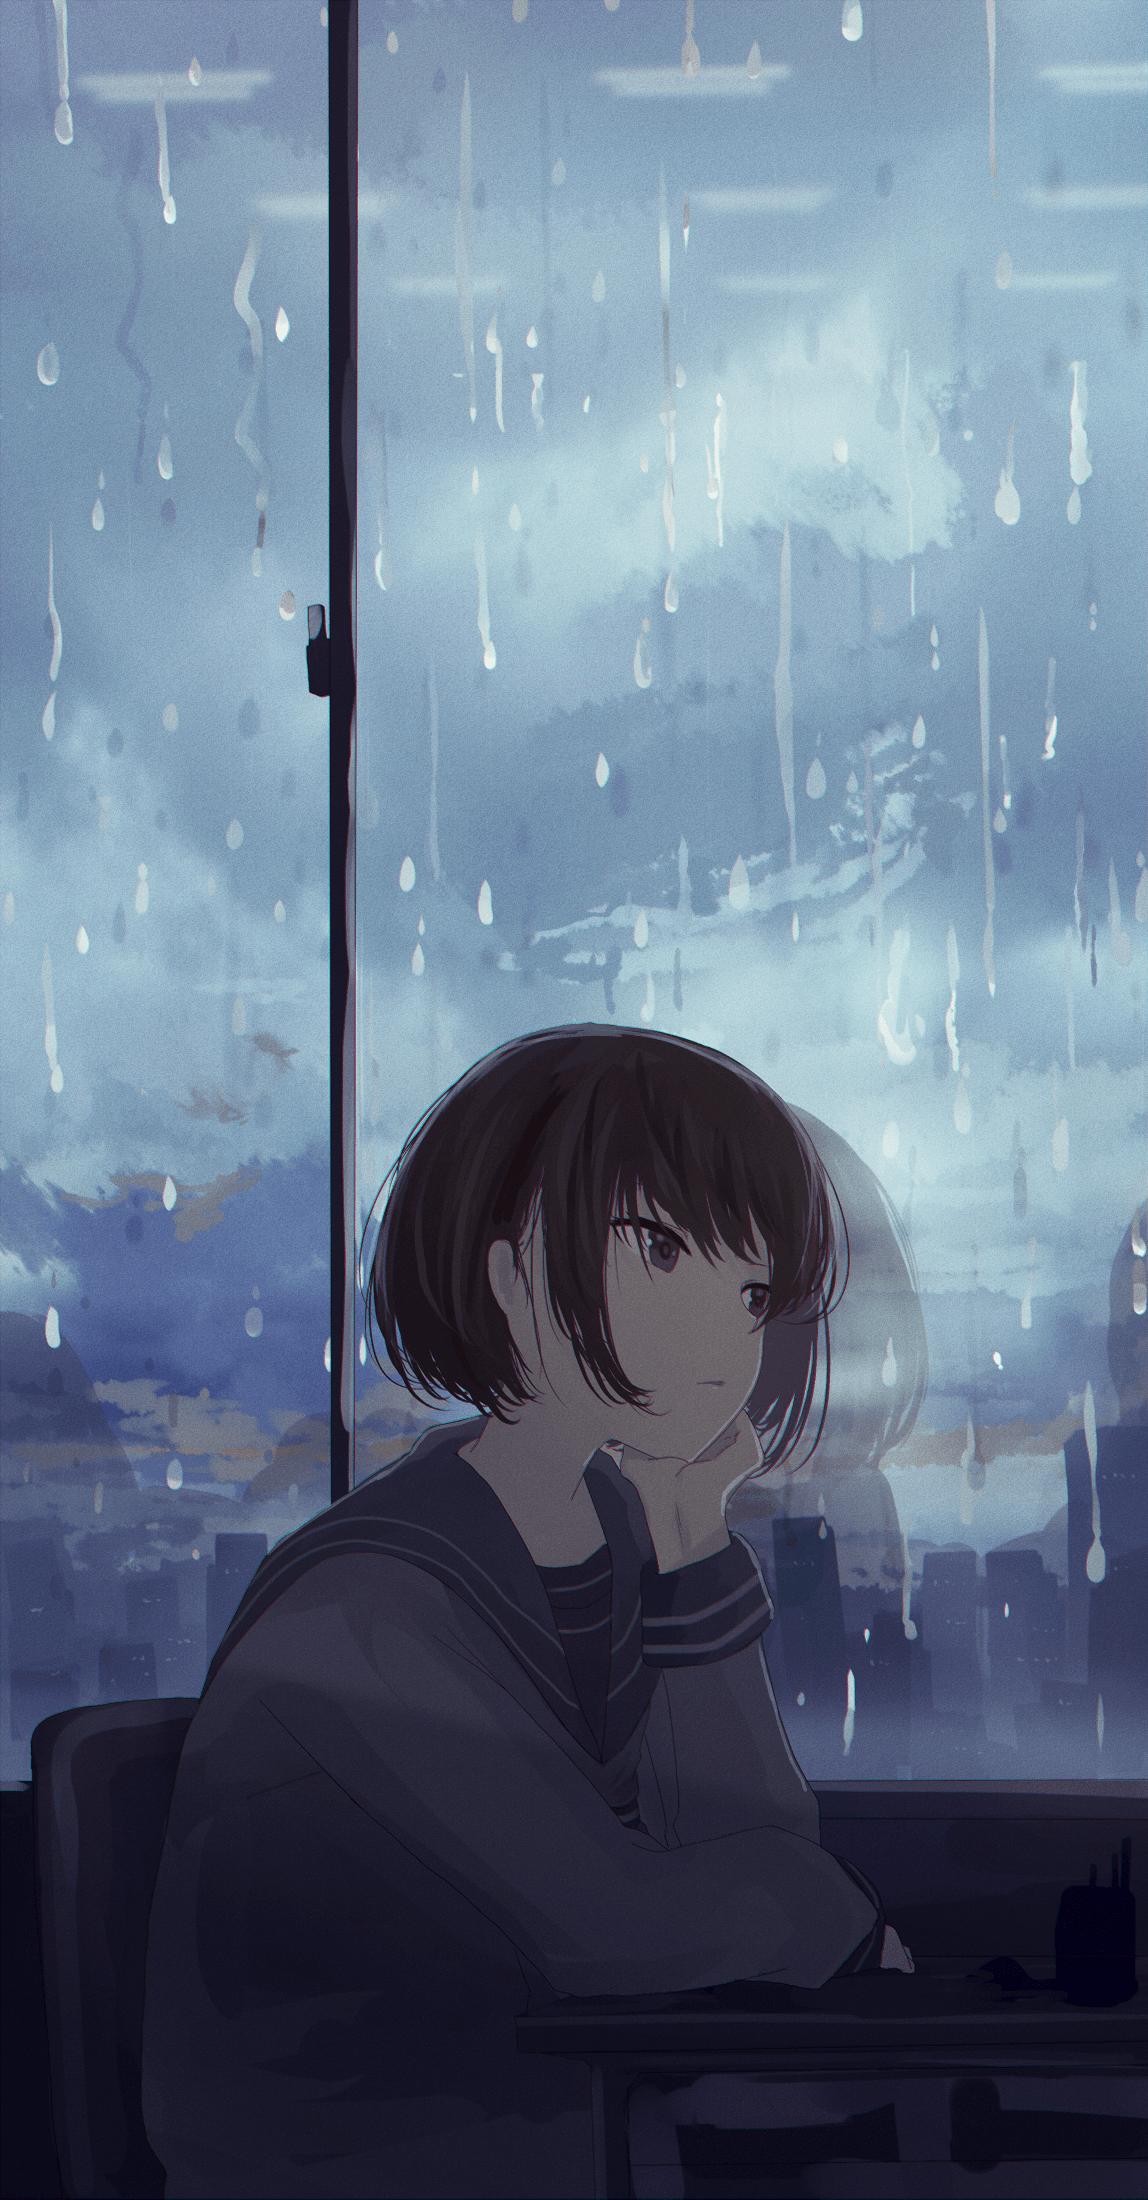 Sad Anime Rain Wallpapers - Wallpaper Cave